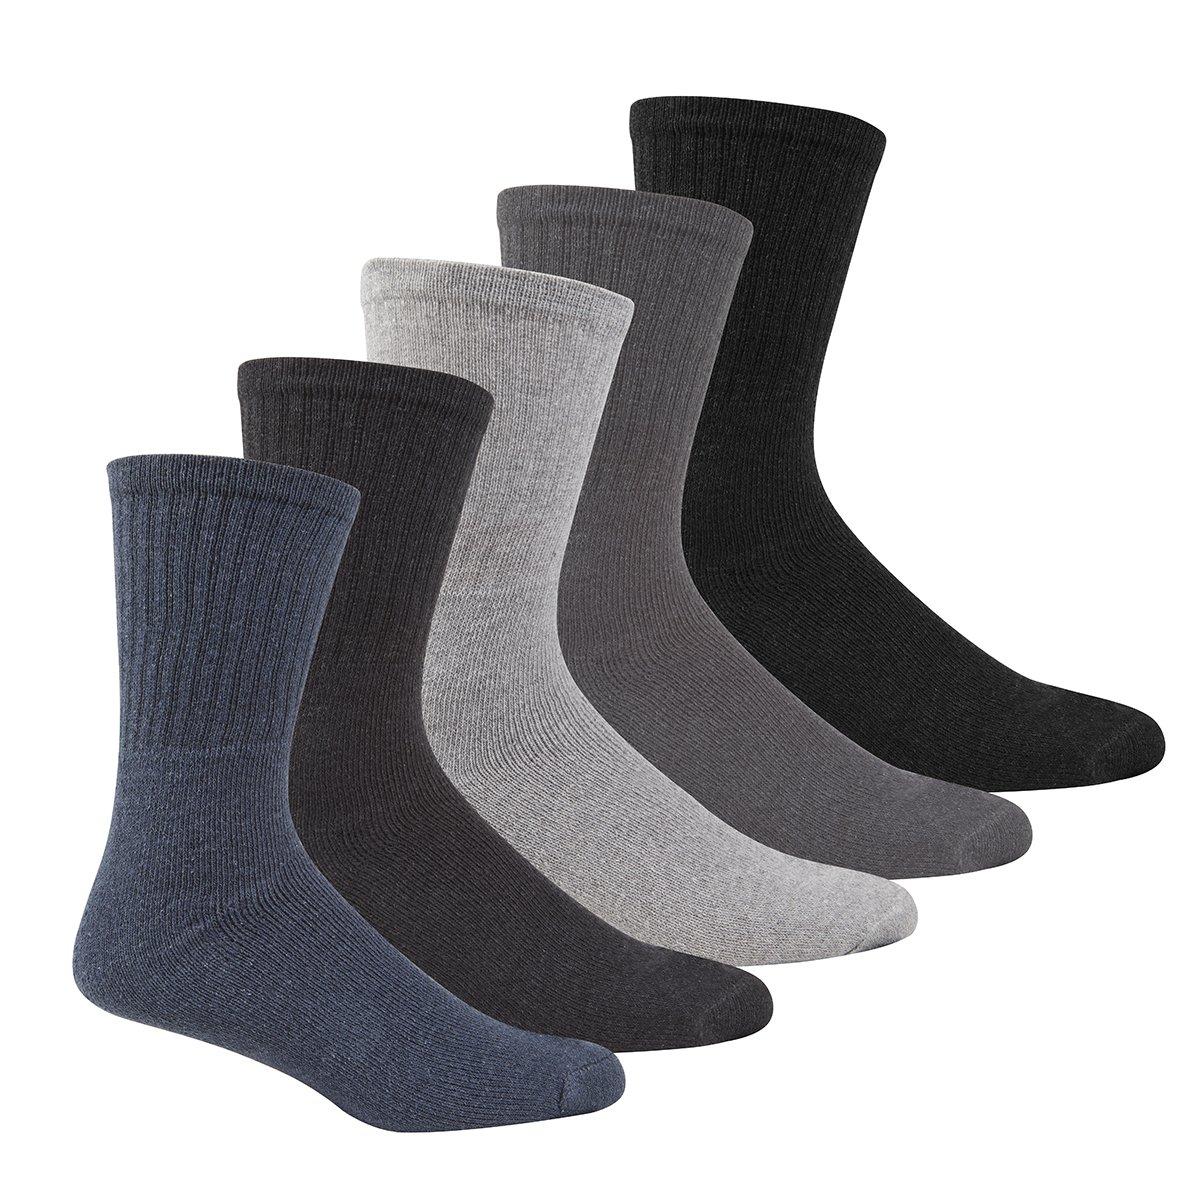 3 Pairs Men/'s Sports Socks Premium Quality Active Gym Socks Cotton Rich UK 6-11